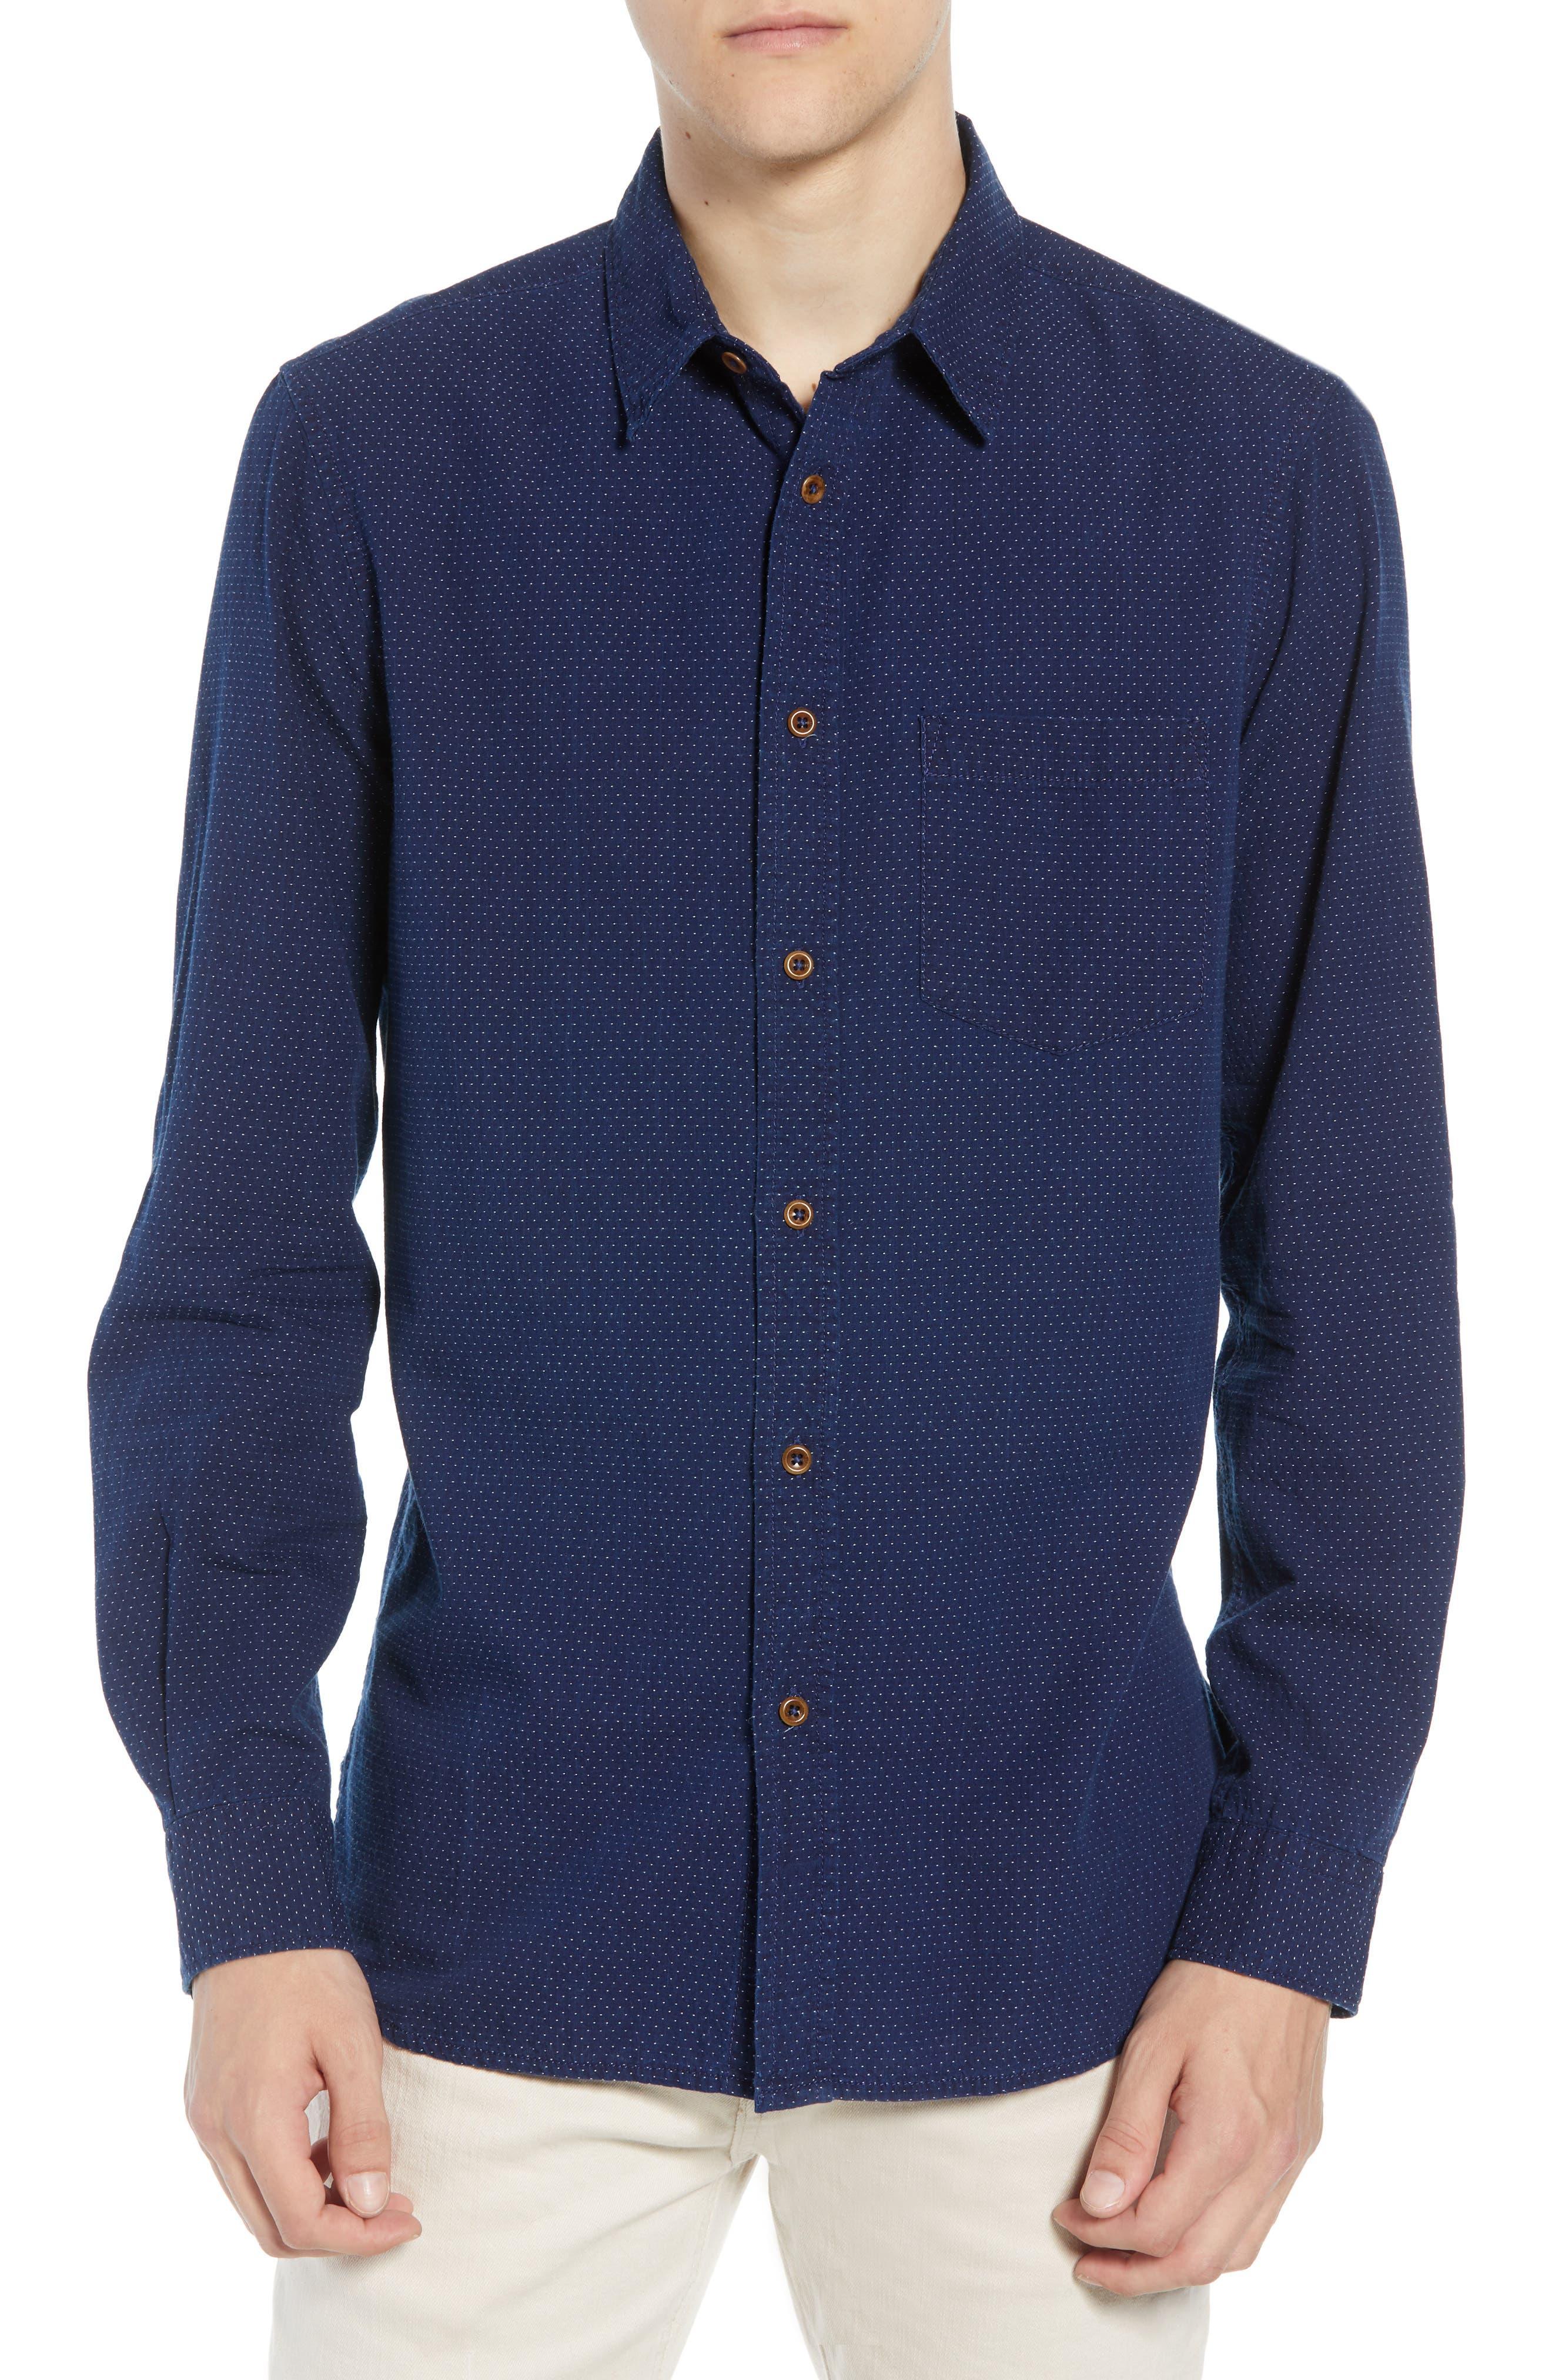 French Connection Indigo Dot Regular Fit Sport Shirt, Blue